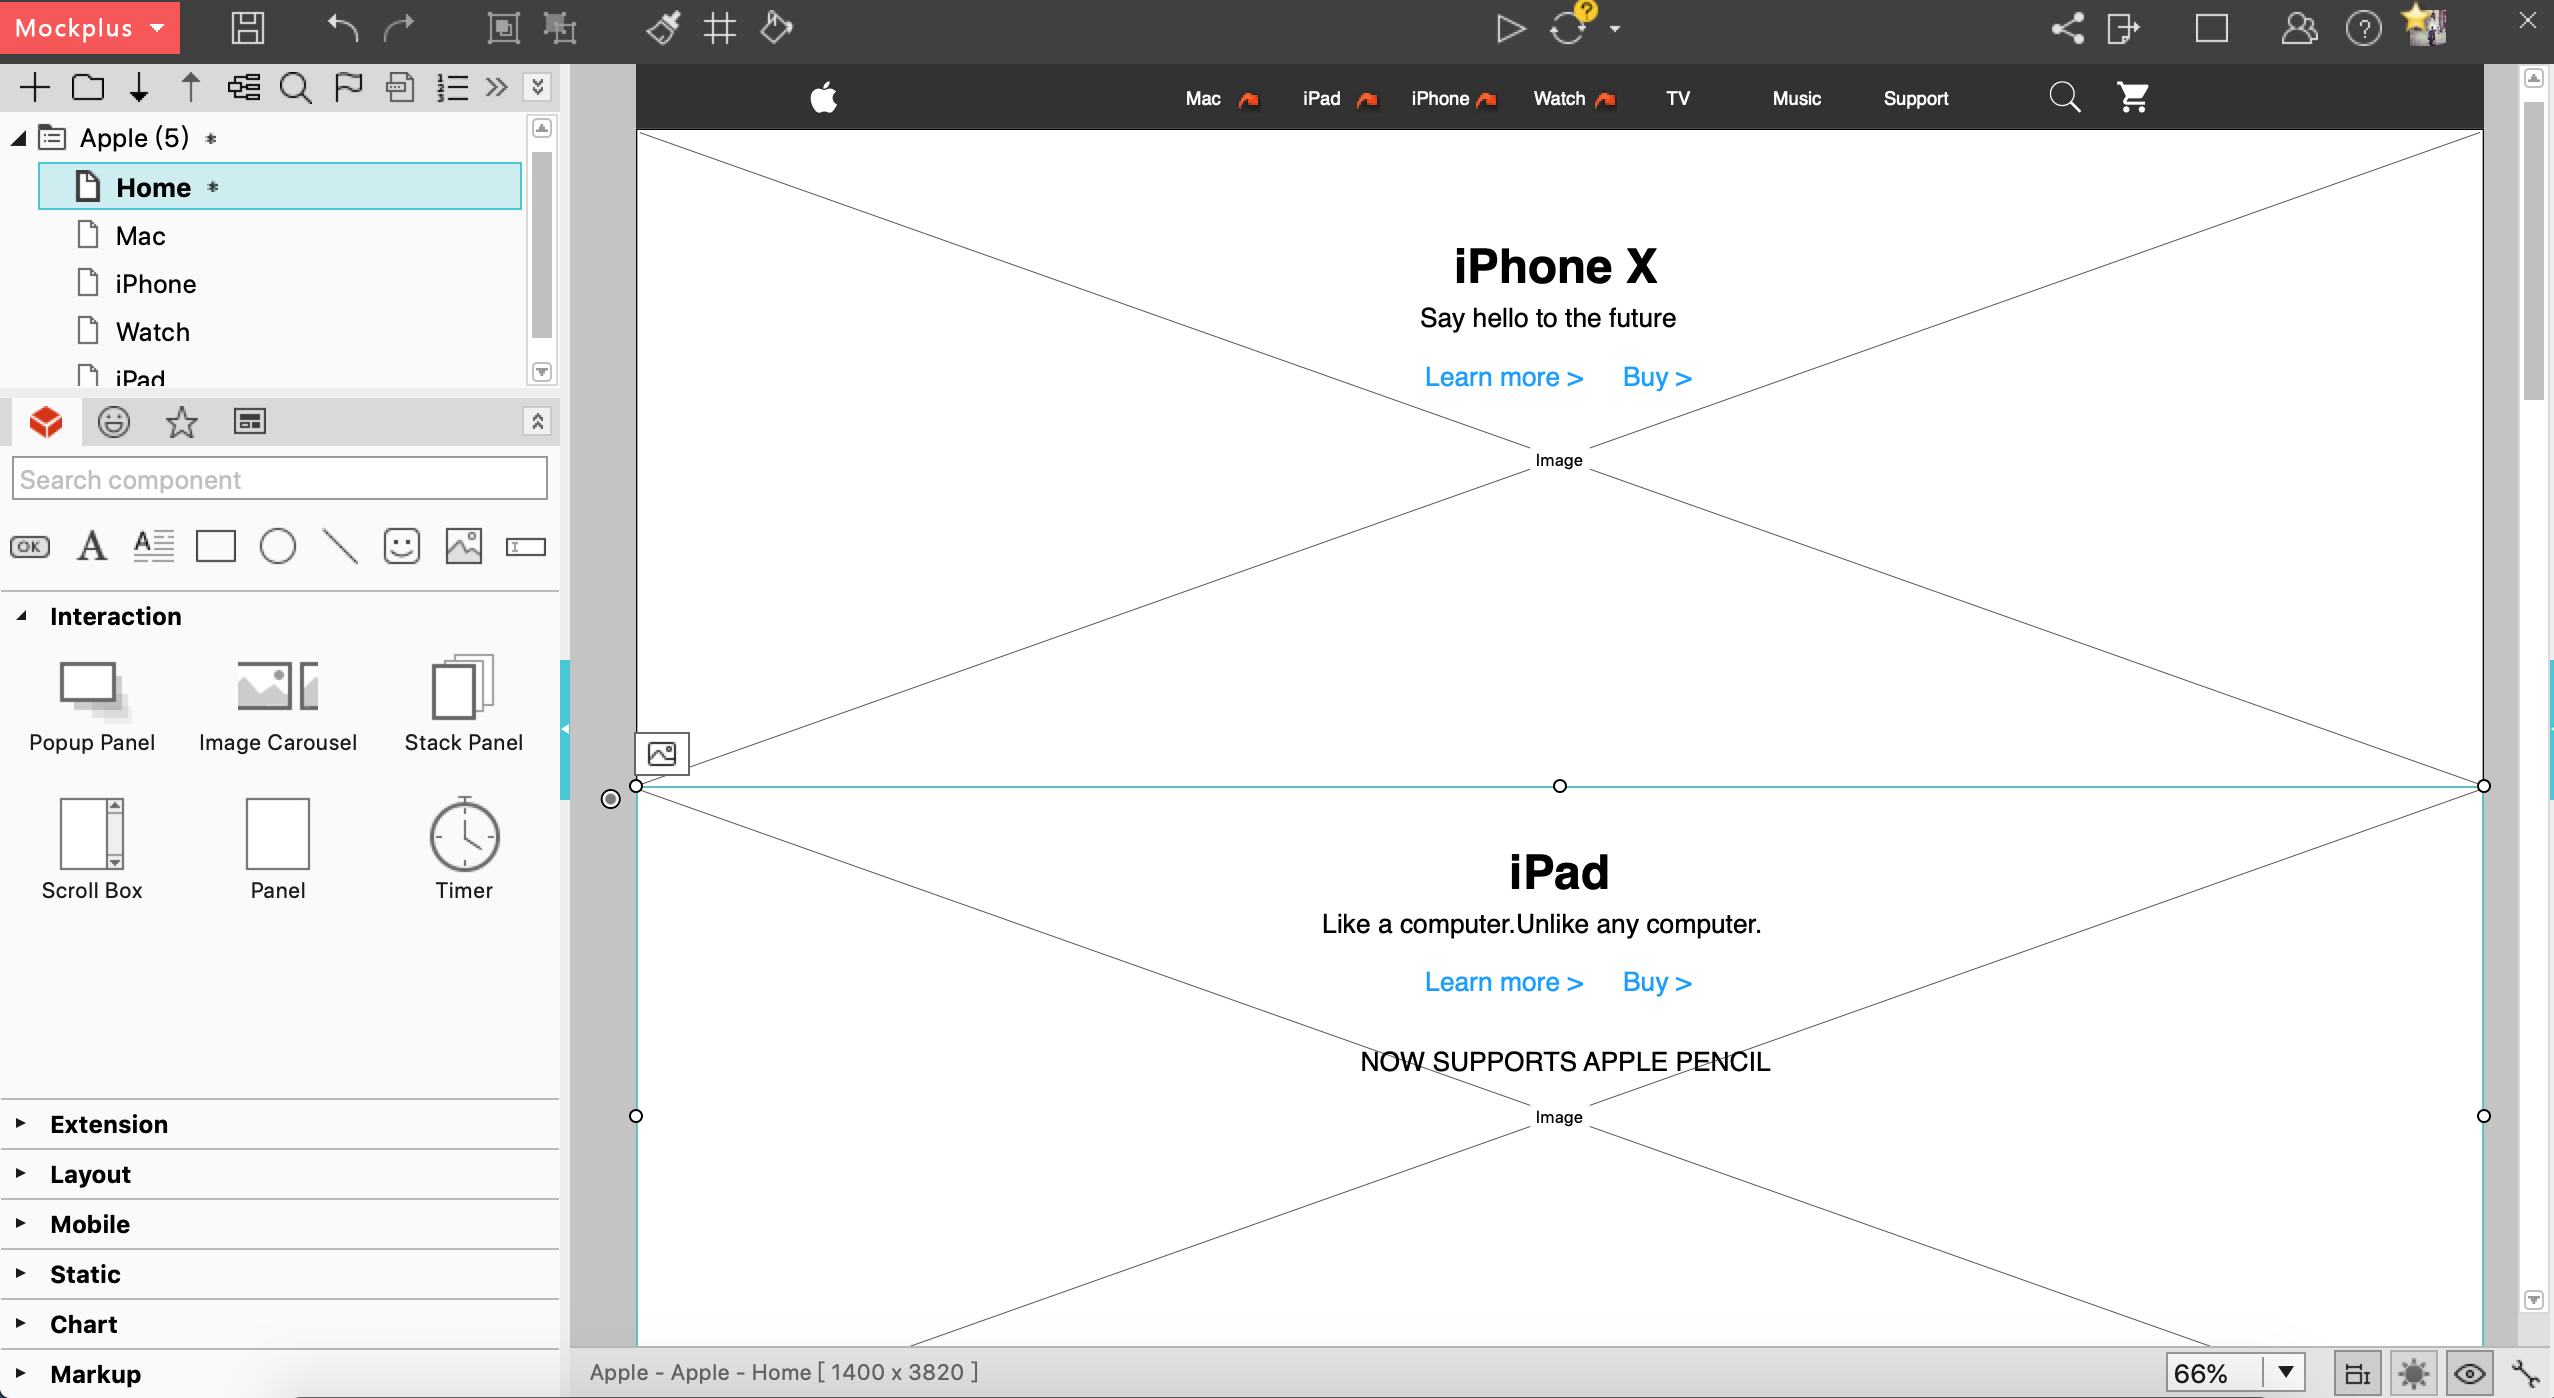 Mockplus home page screenshot